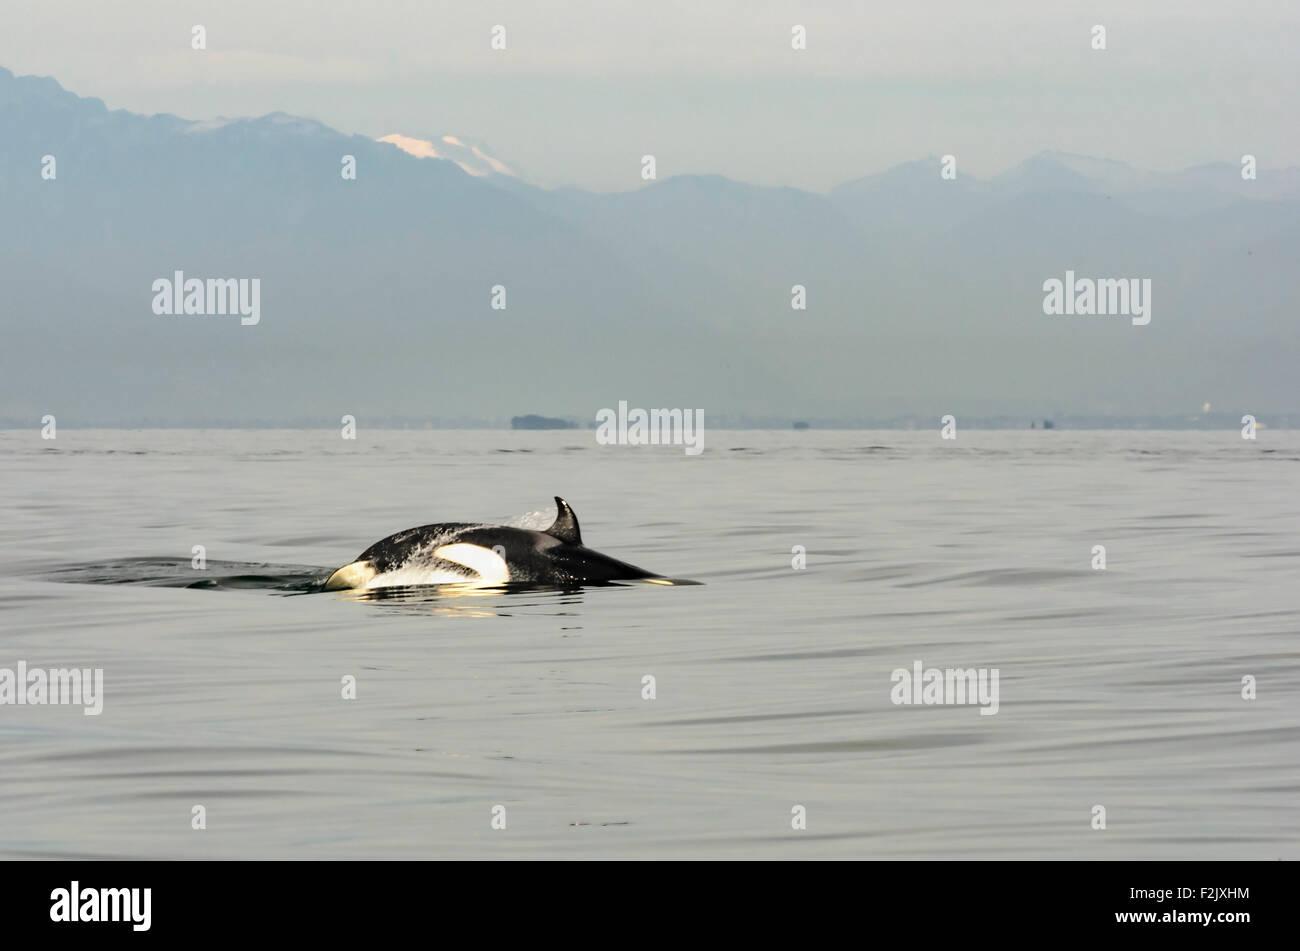 Transient or Bigg's killer whale, Orcinus orca, British Columbia, Canada, Pacific - Stock Image